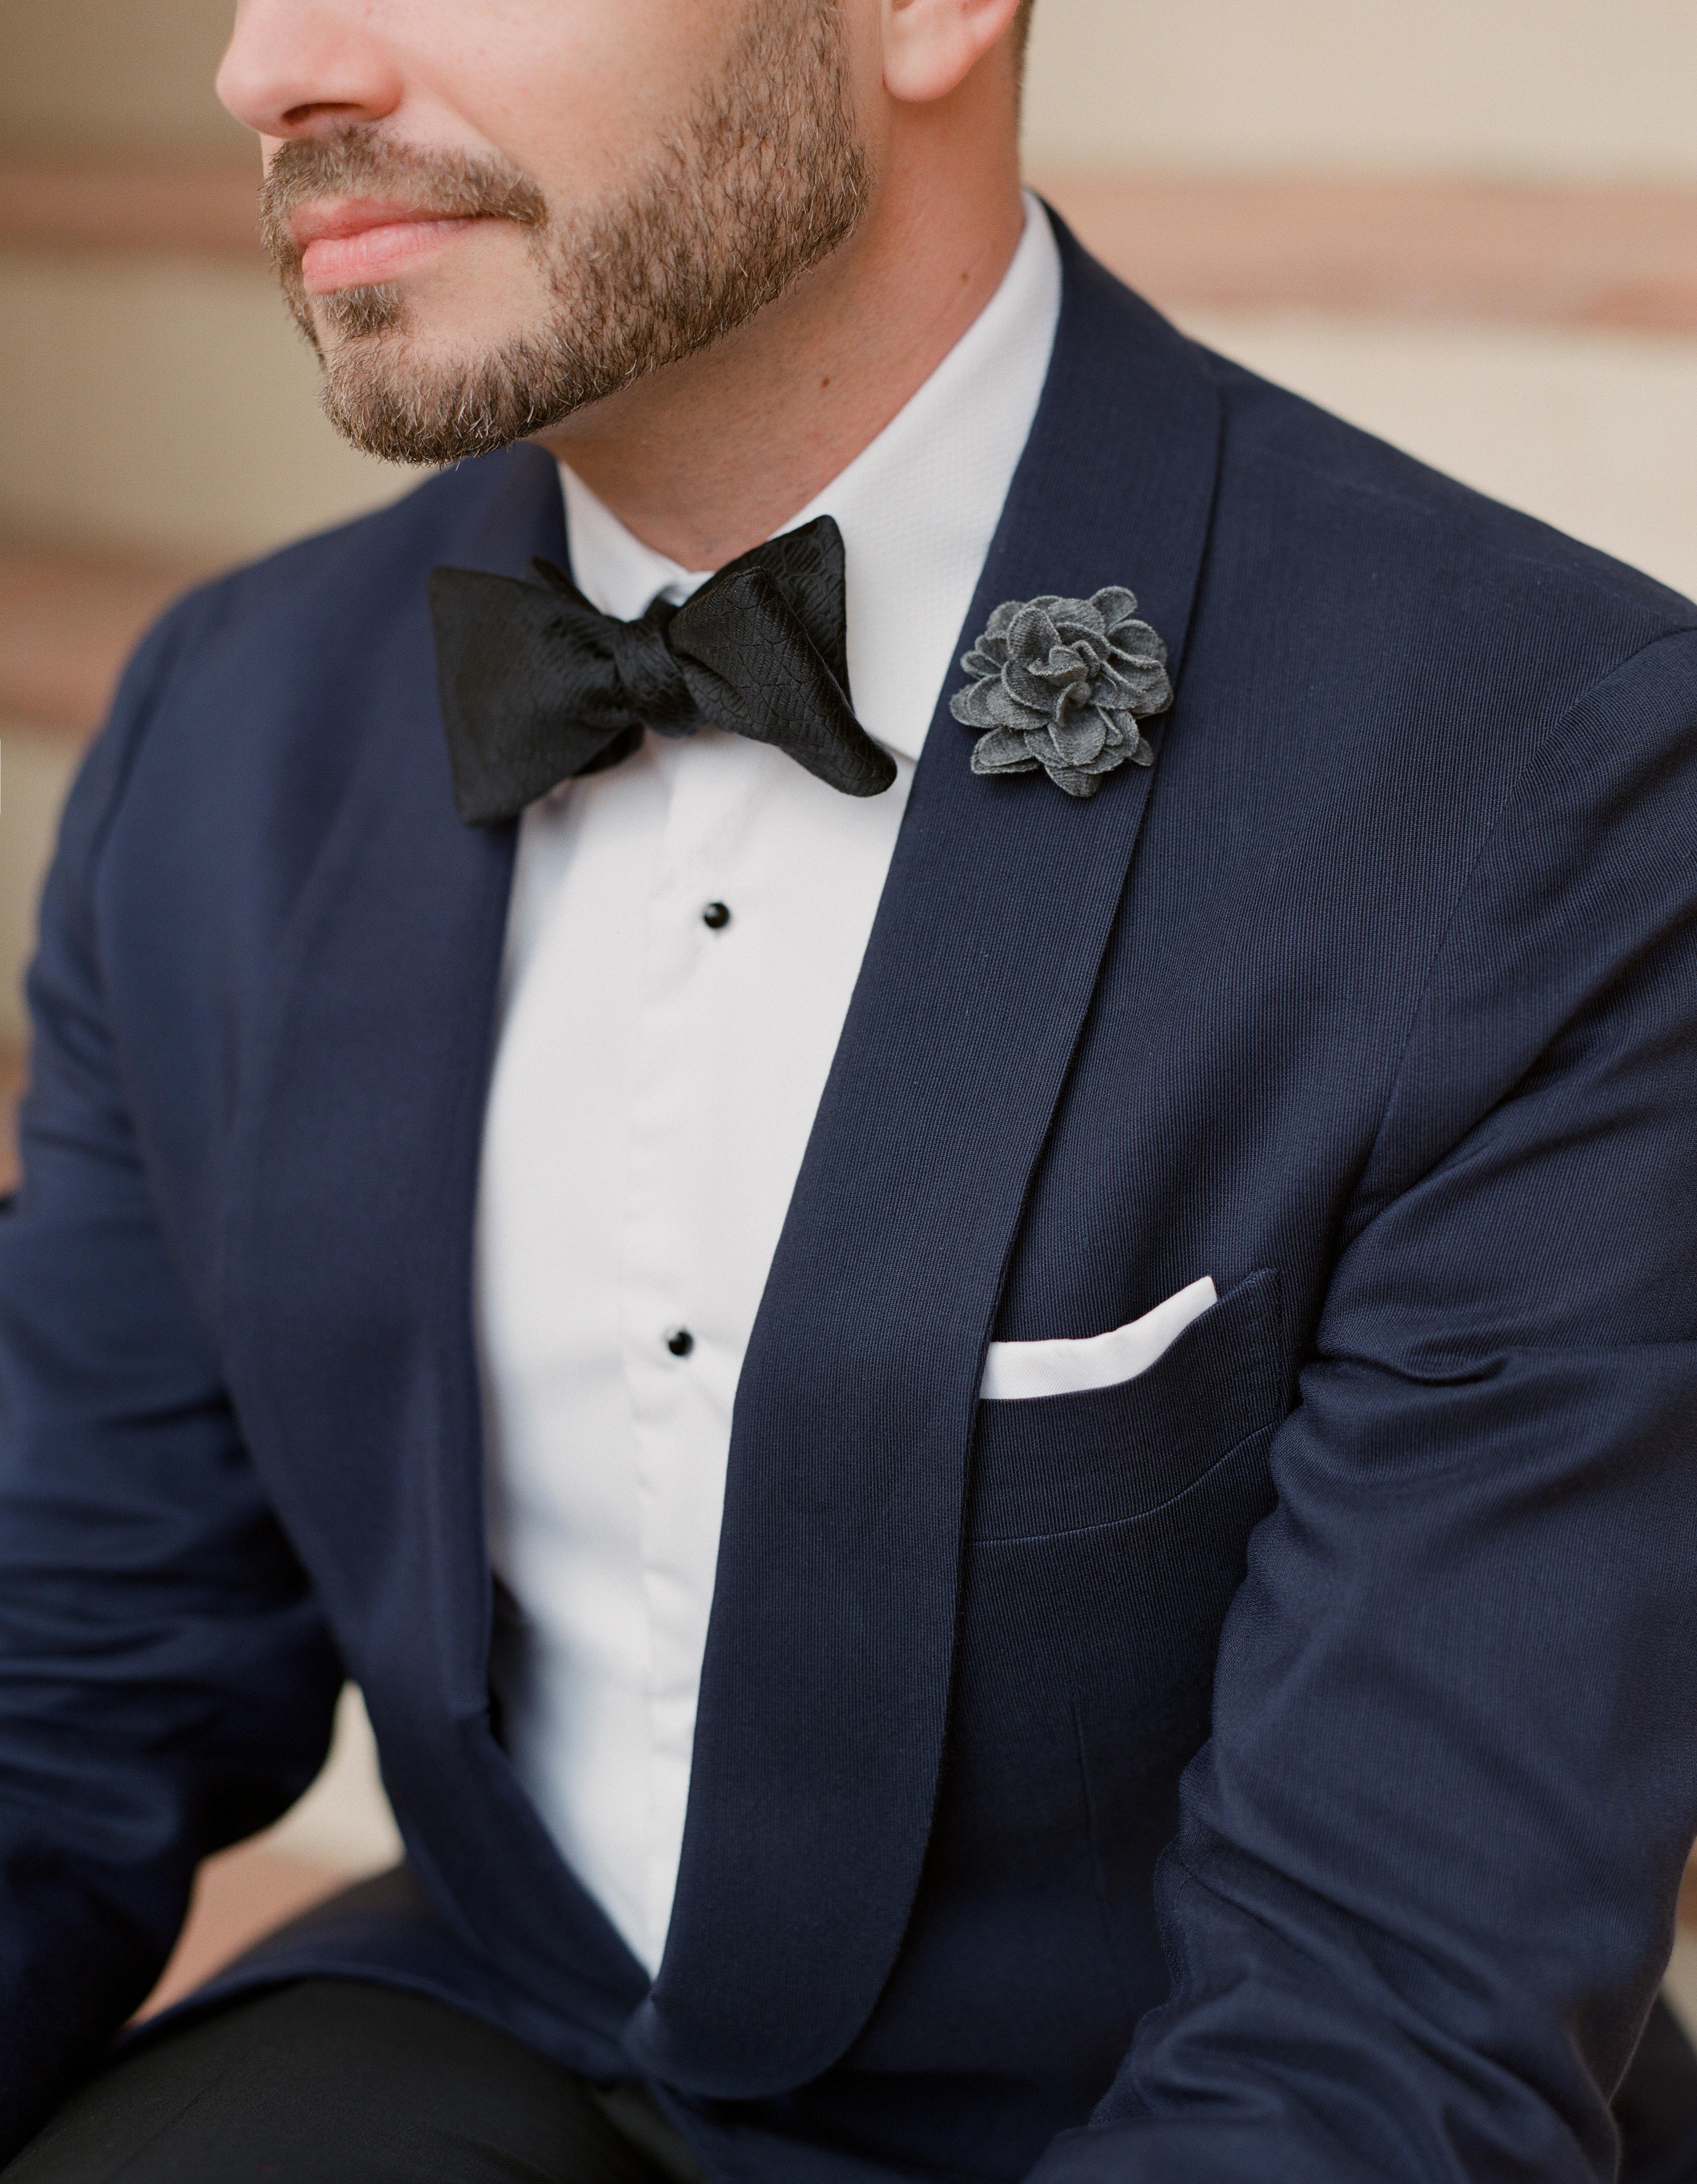 the-dapper-diplomat-timeless-fashion-tips-1016.jpg (skyword:344285)